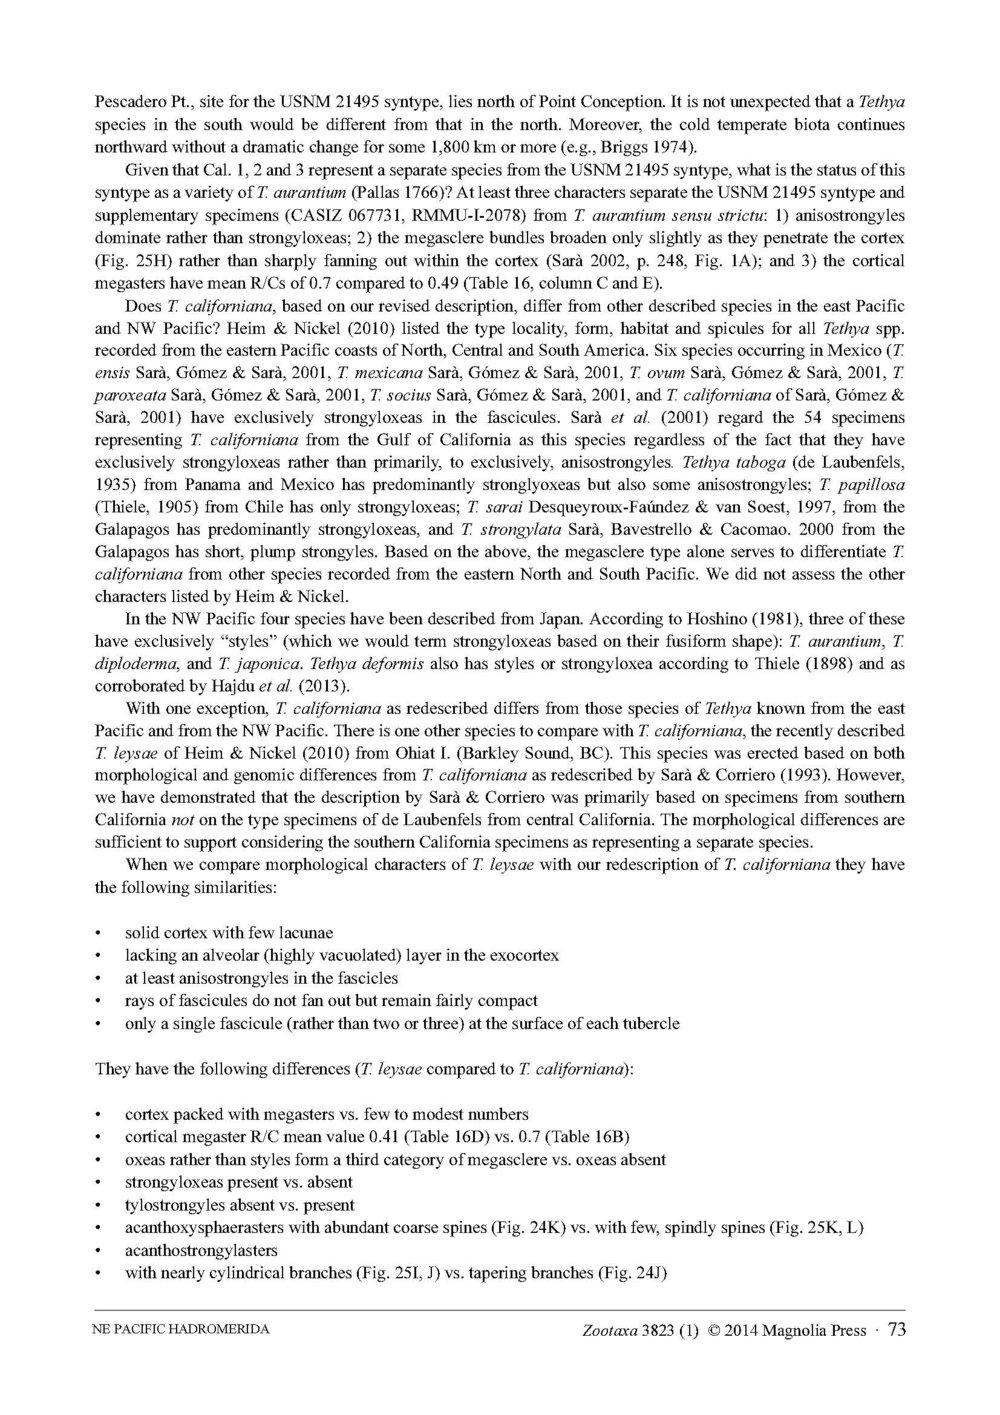 Austin et al 2014 NE Pacific Hadromerids_Page_73.jpg